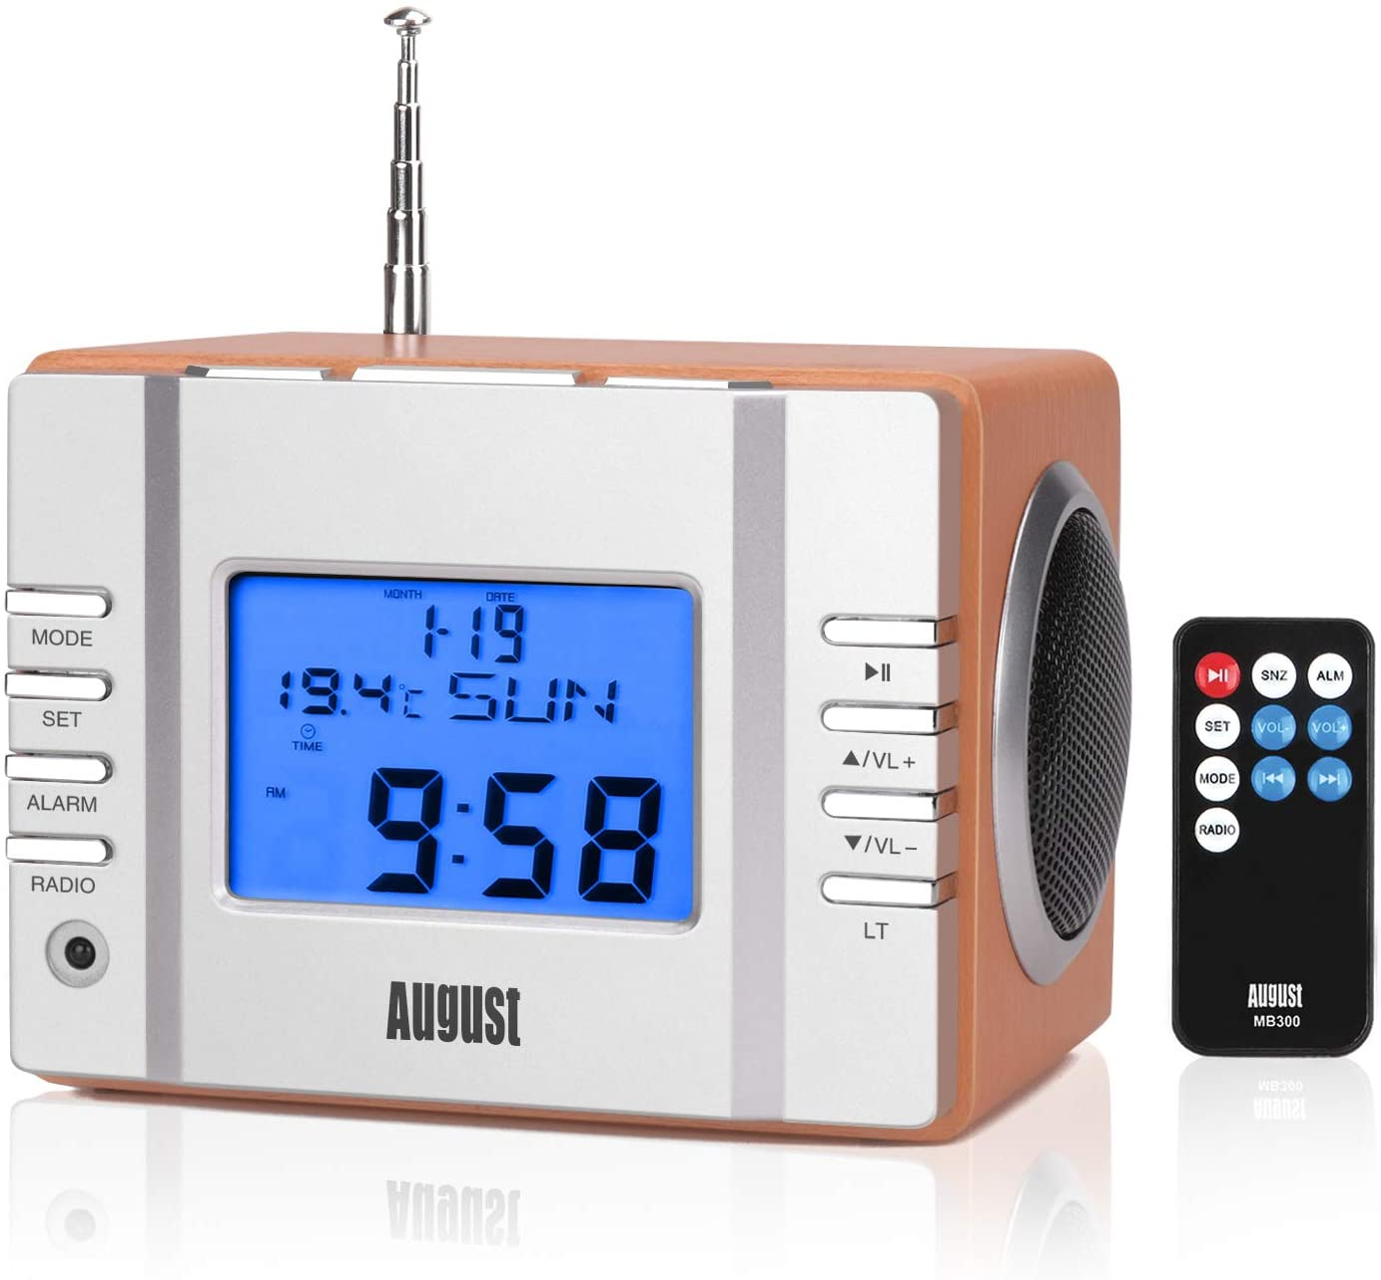 August MB300 Radiodespertadores Sistema Estéreo con Altavoz - FM Reloj de Radio con Función Alarma / Sleep Timer / Termómetro - Radio Despertador Leer MP3/ Tarjeta SD / Jack 3.5mm - Telecomando